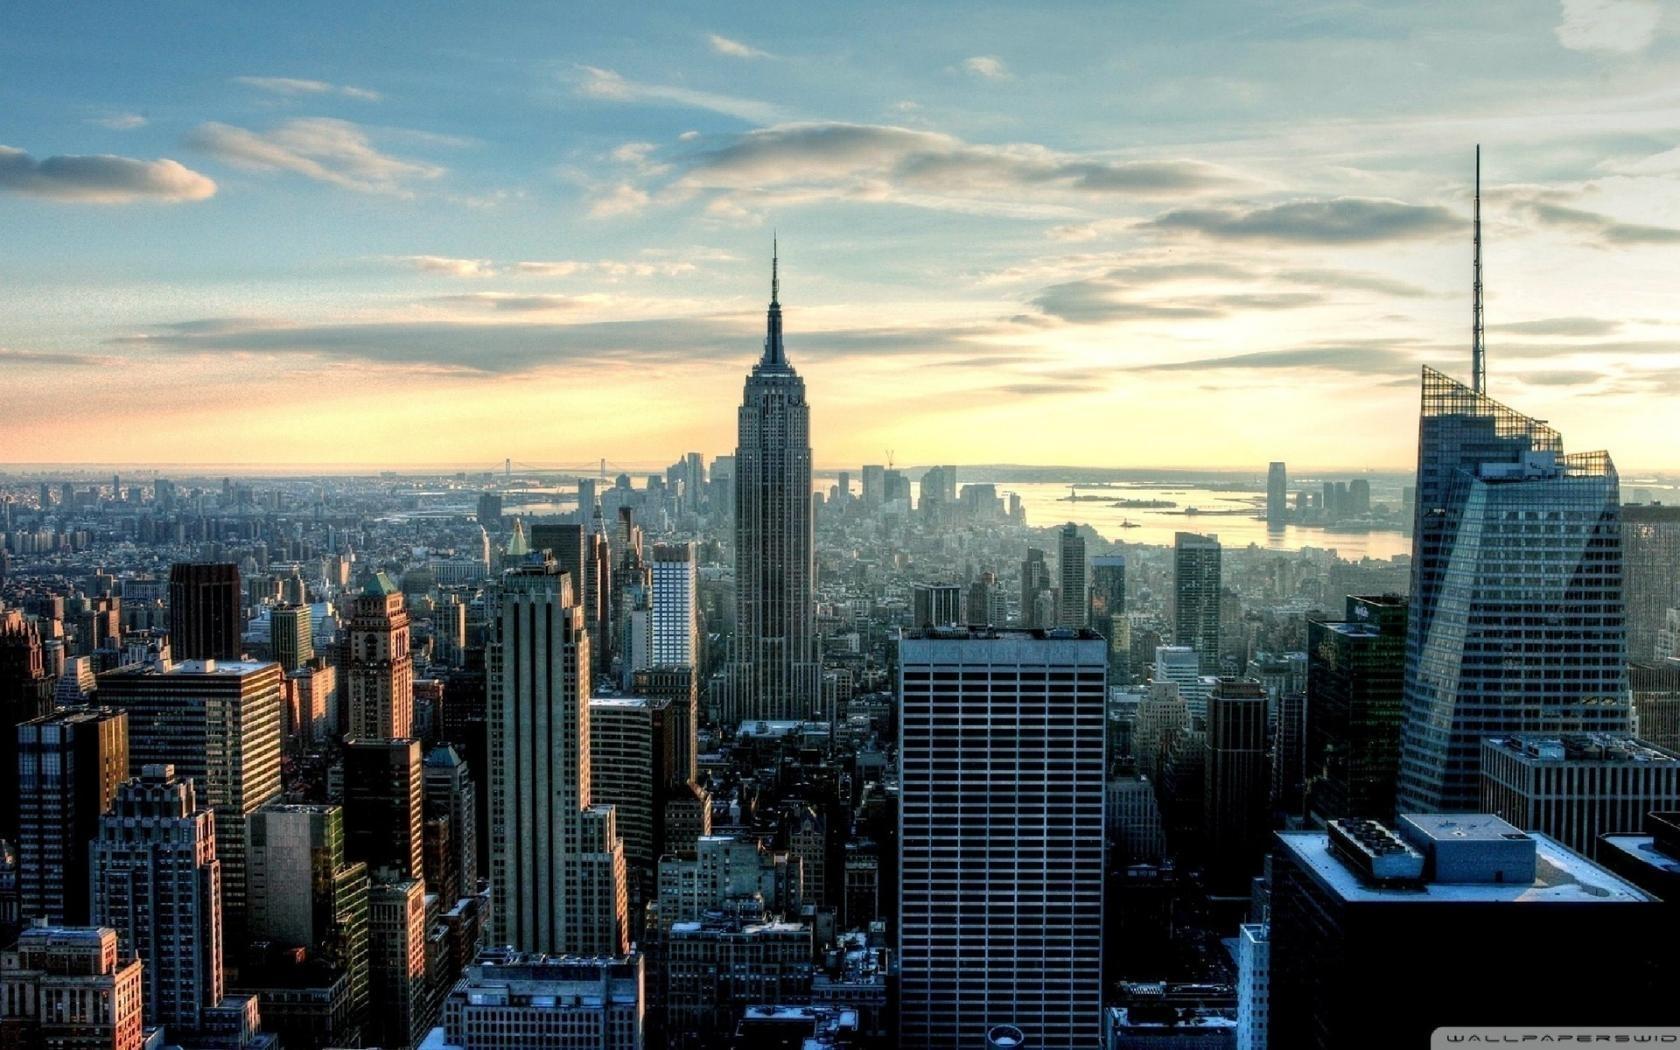 new york city desktop backgrounds - wallpaper cave